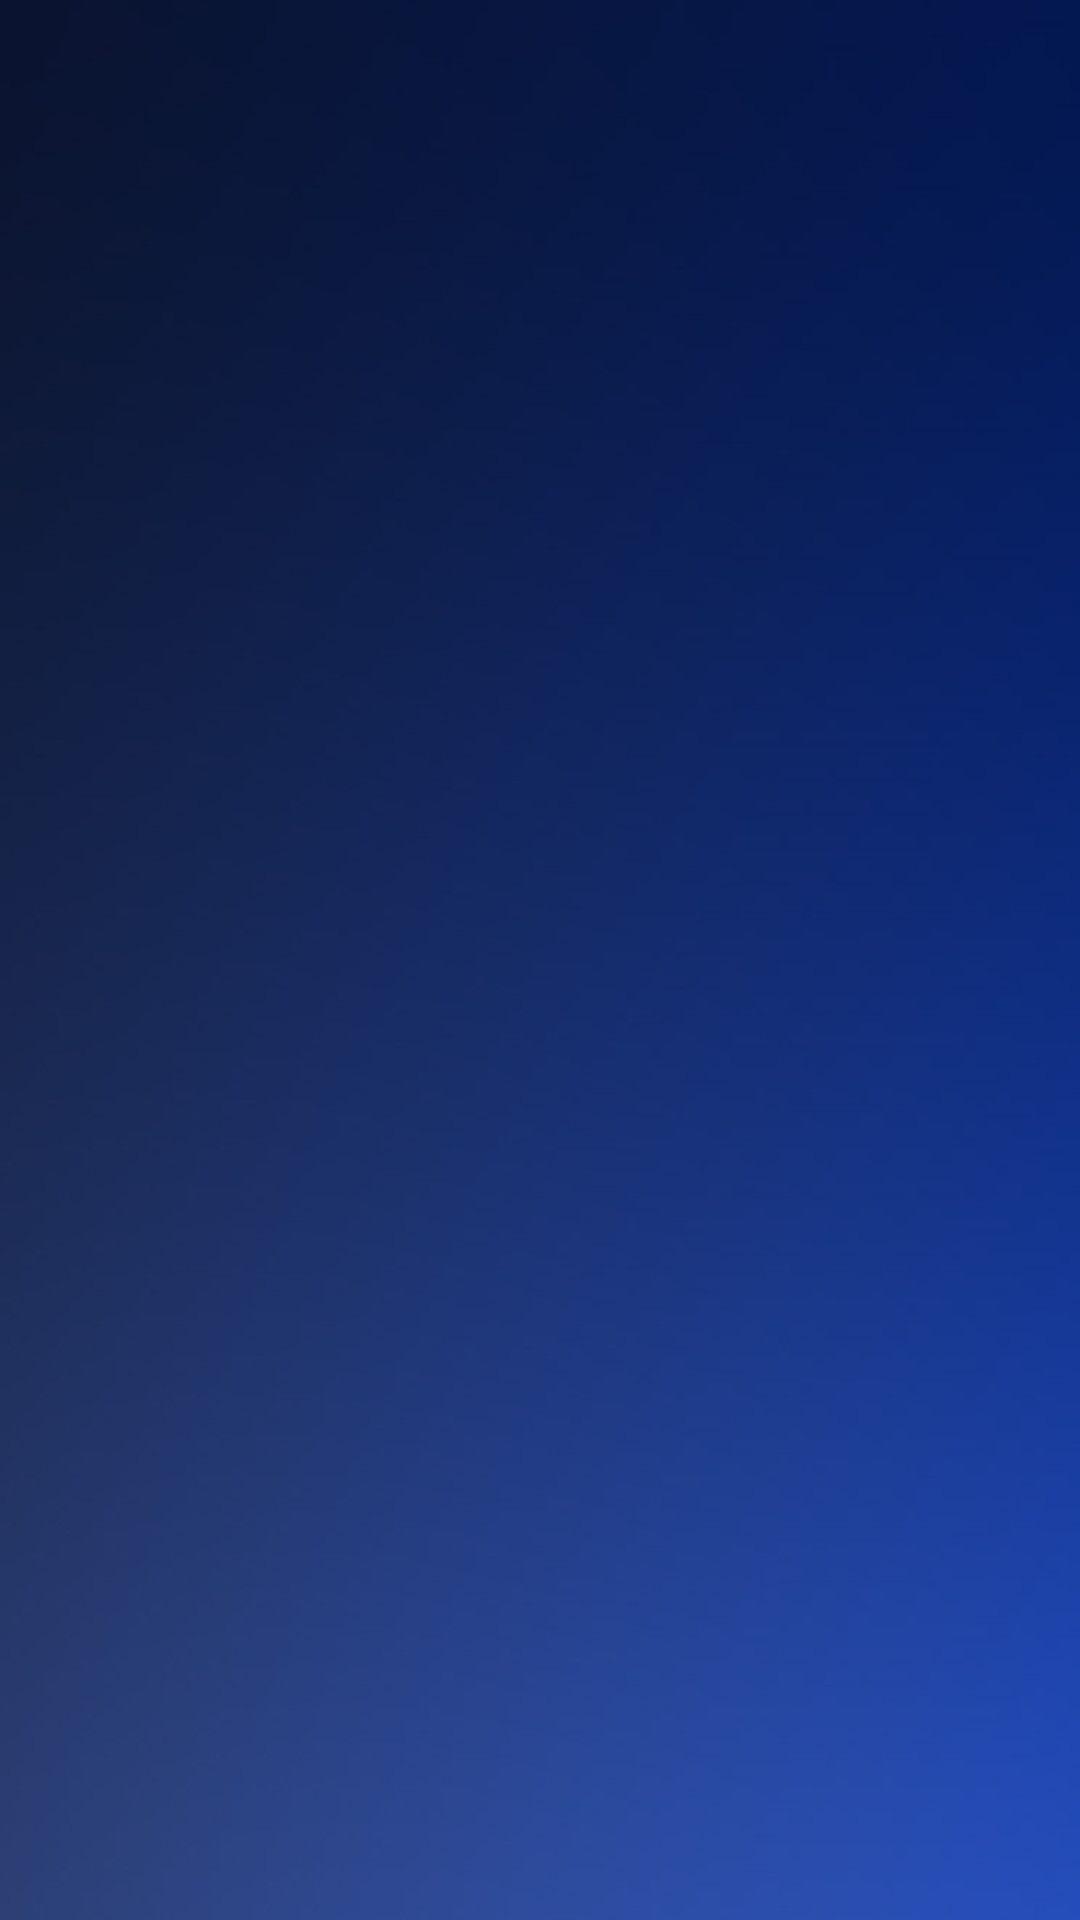 Pin By Parmar Natwar On Mobile Wallpaper Blue Wallpaper Phone